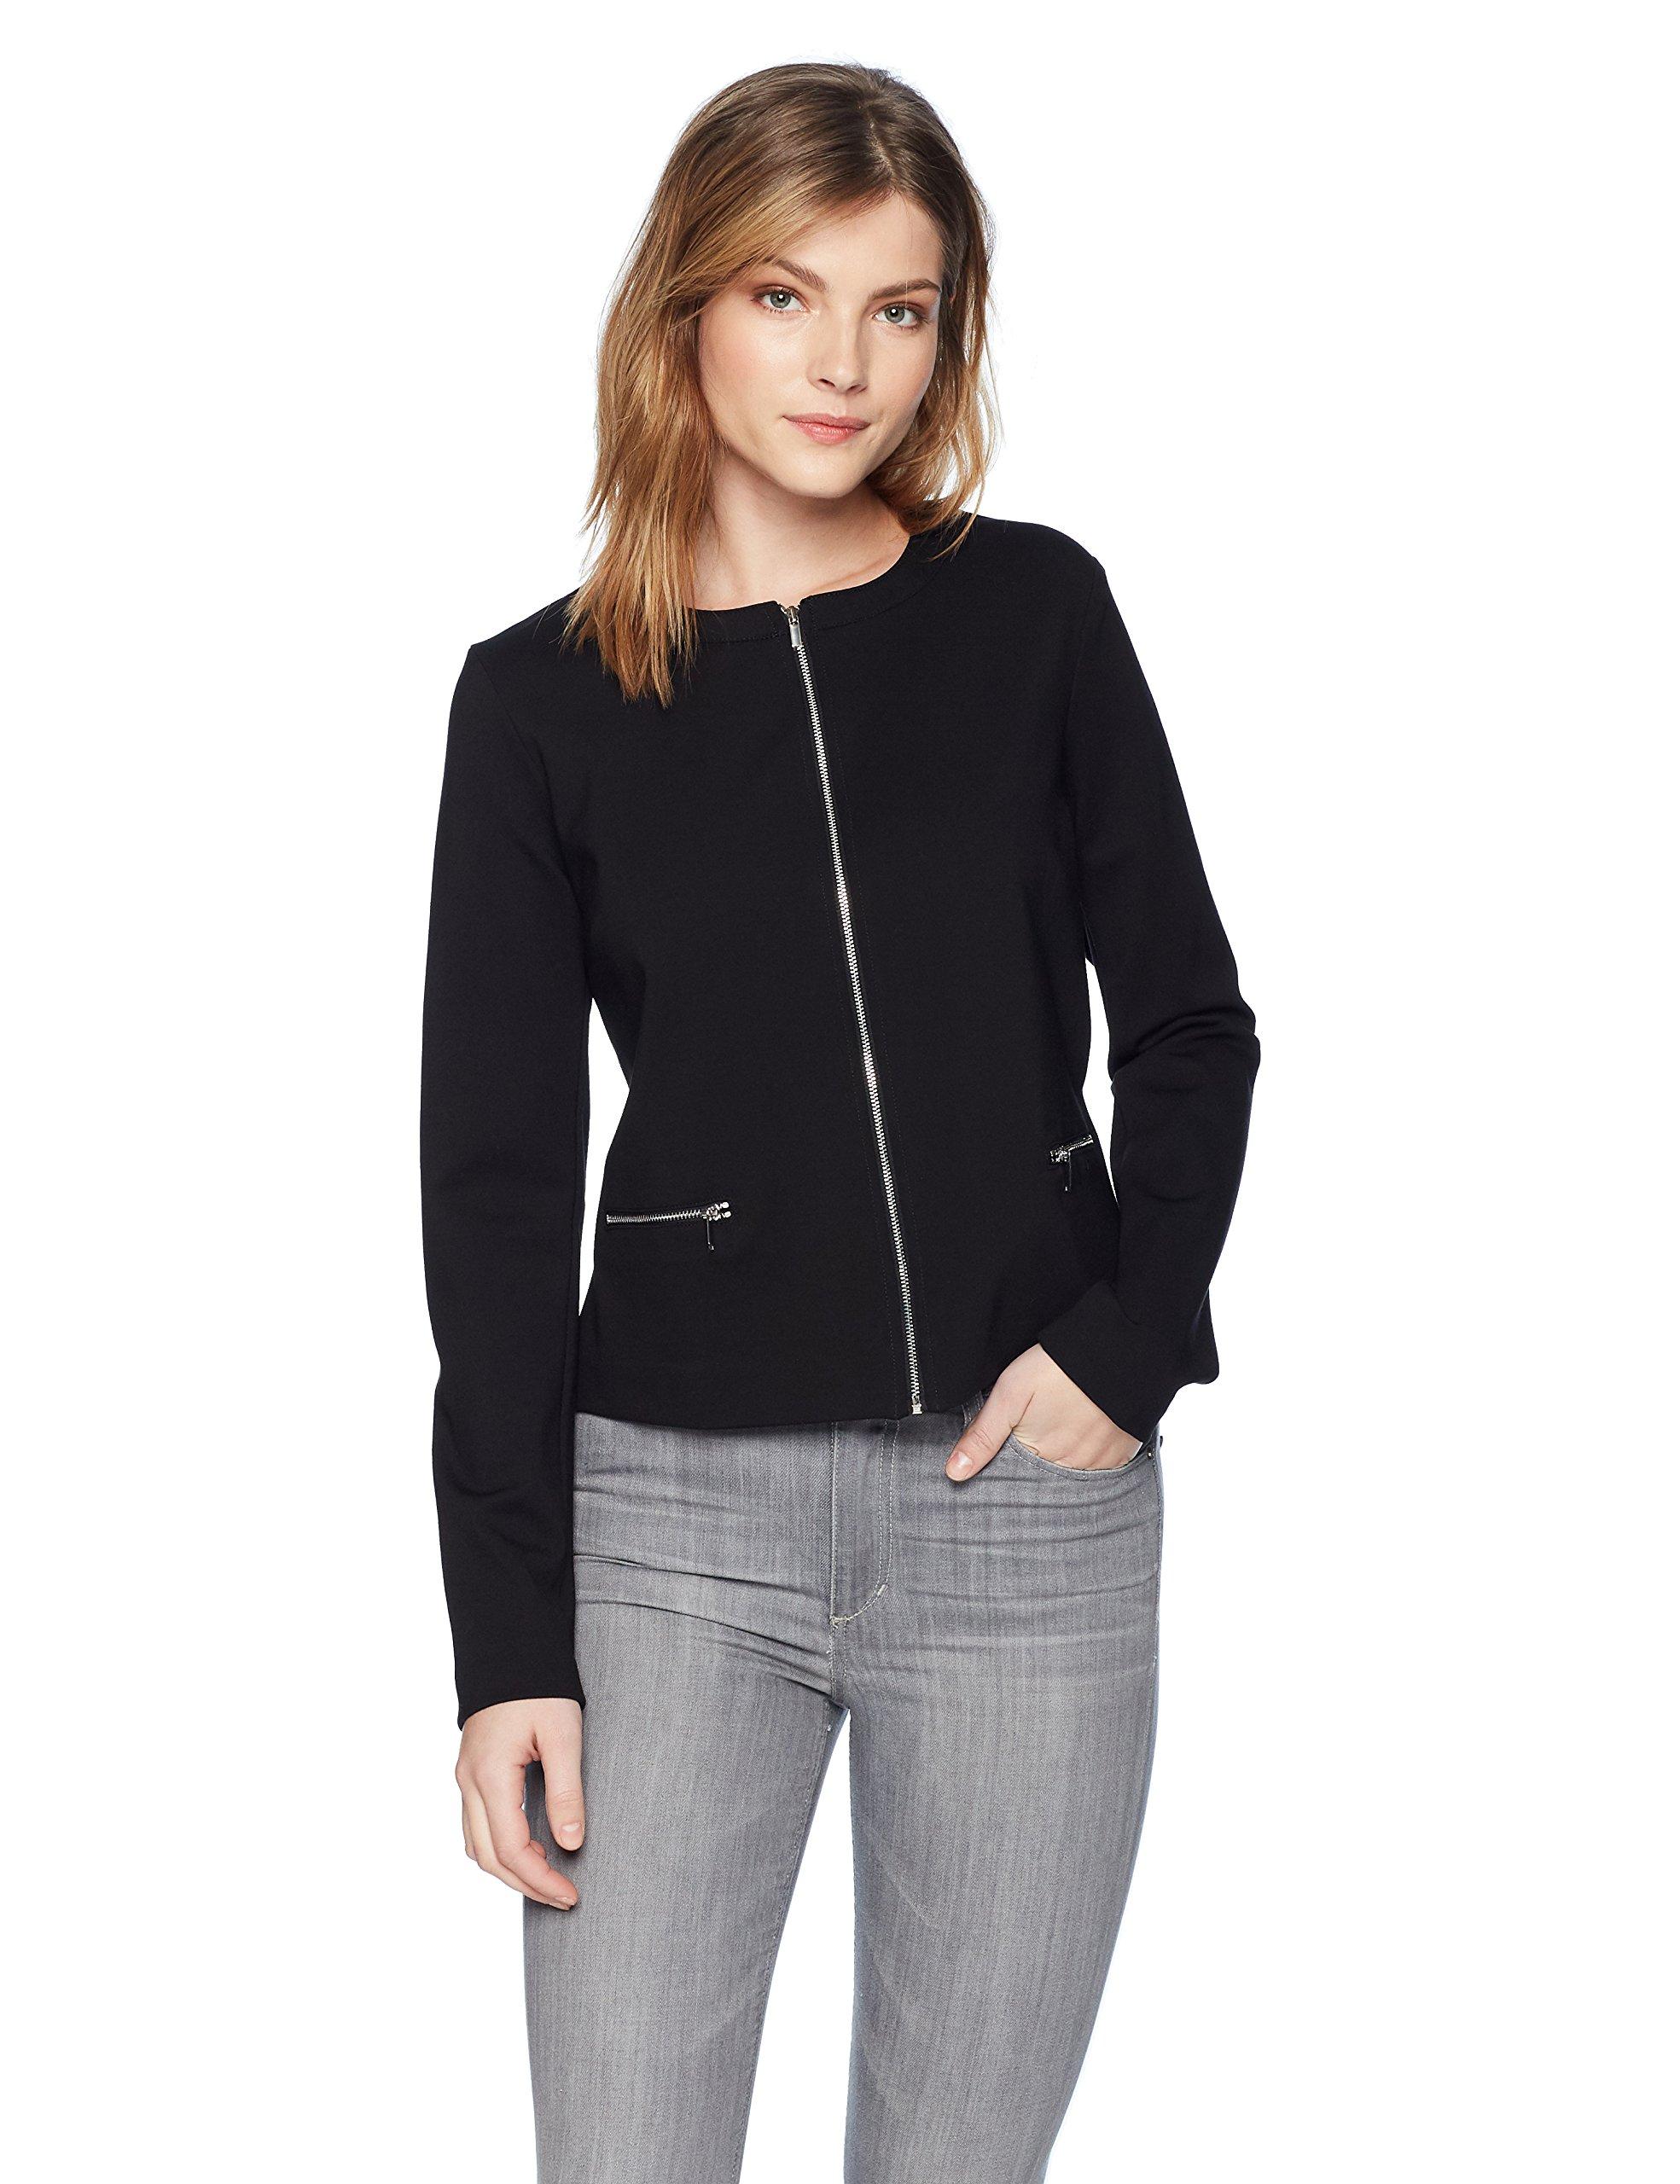 Three Dots Women's Ponte Tight Short Jacket, Black, Extra Large